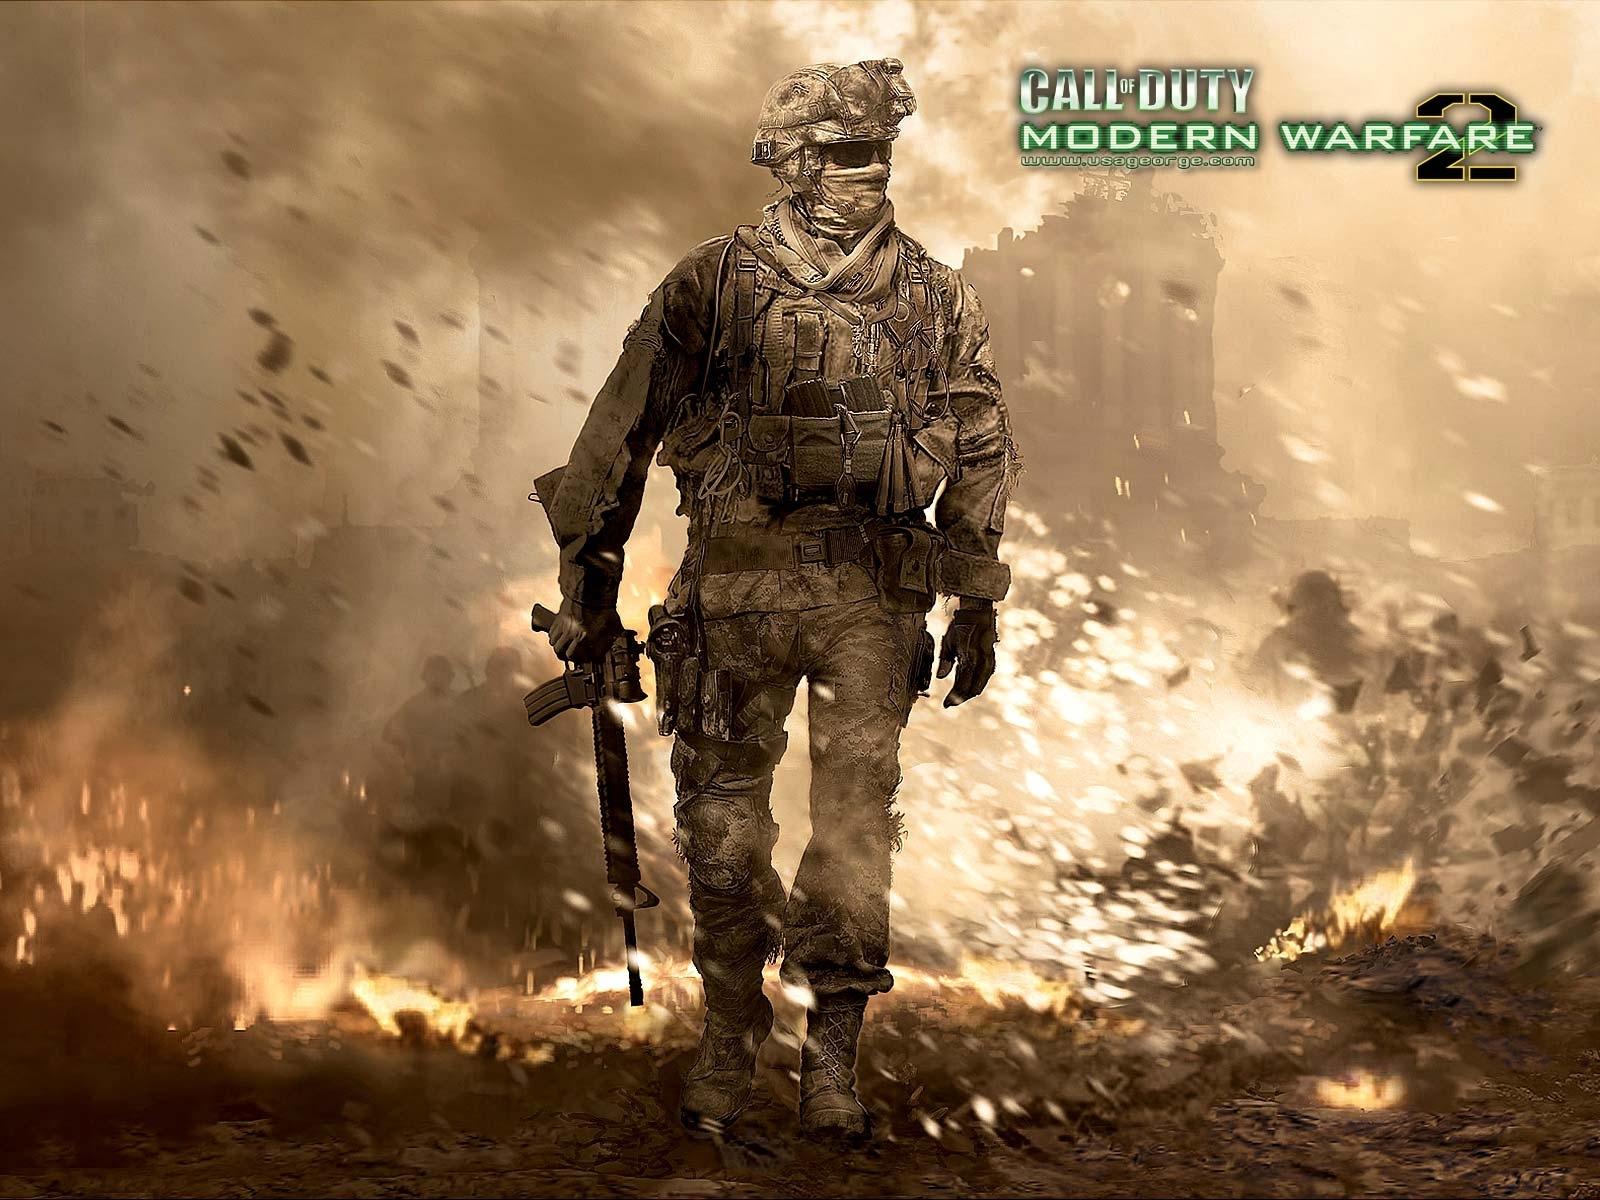 call of duty modern warfare 2 wallpapers   hd wallpapers   id #7244